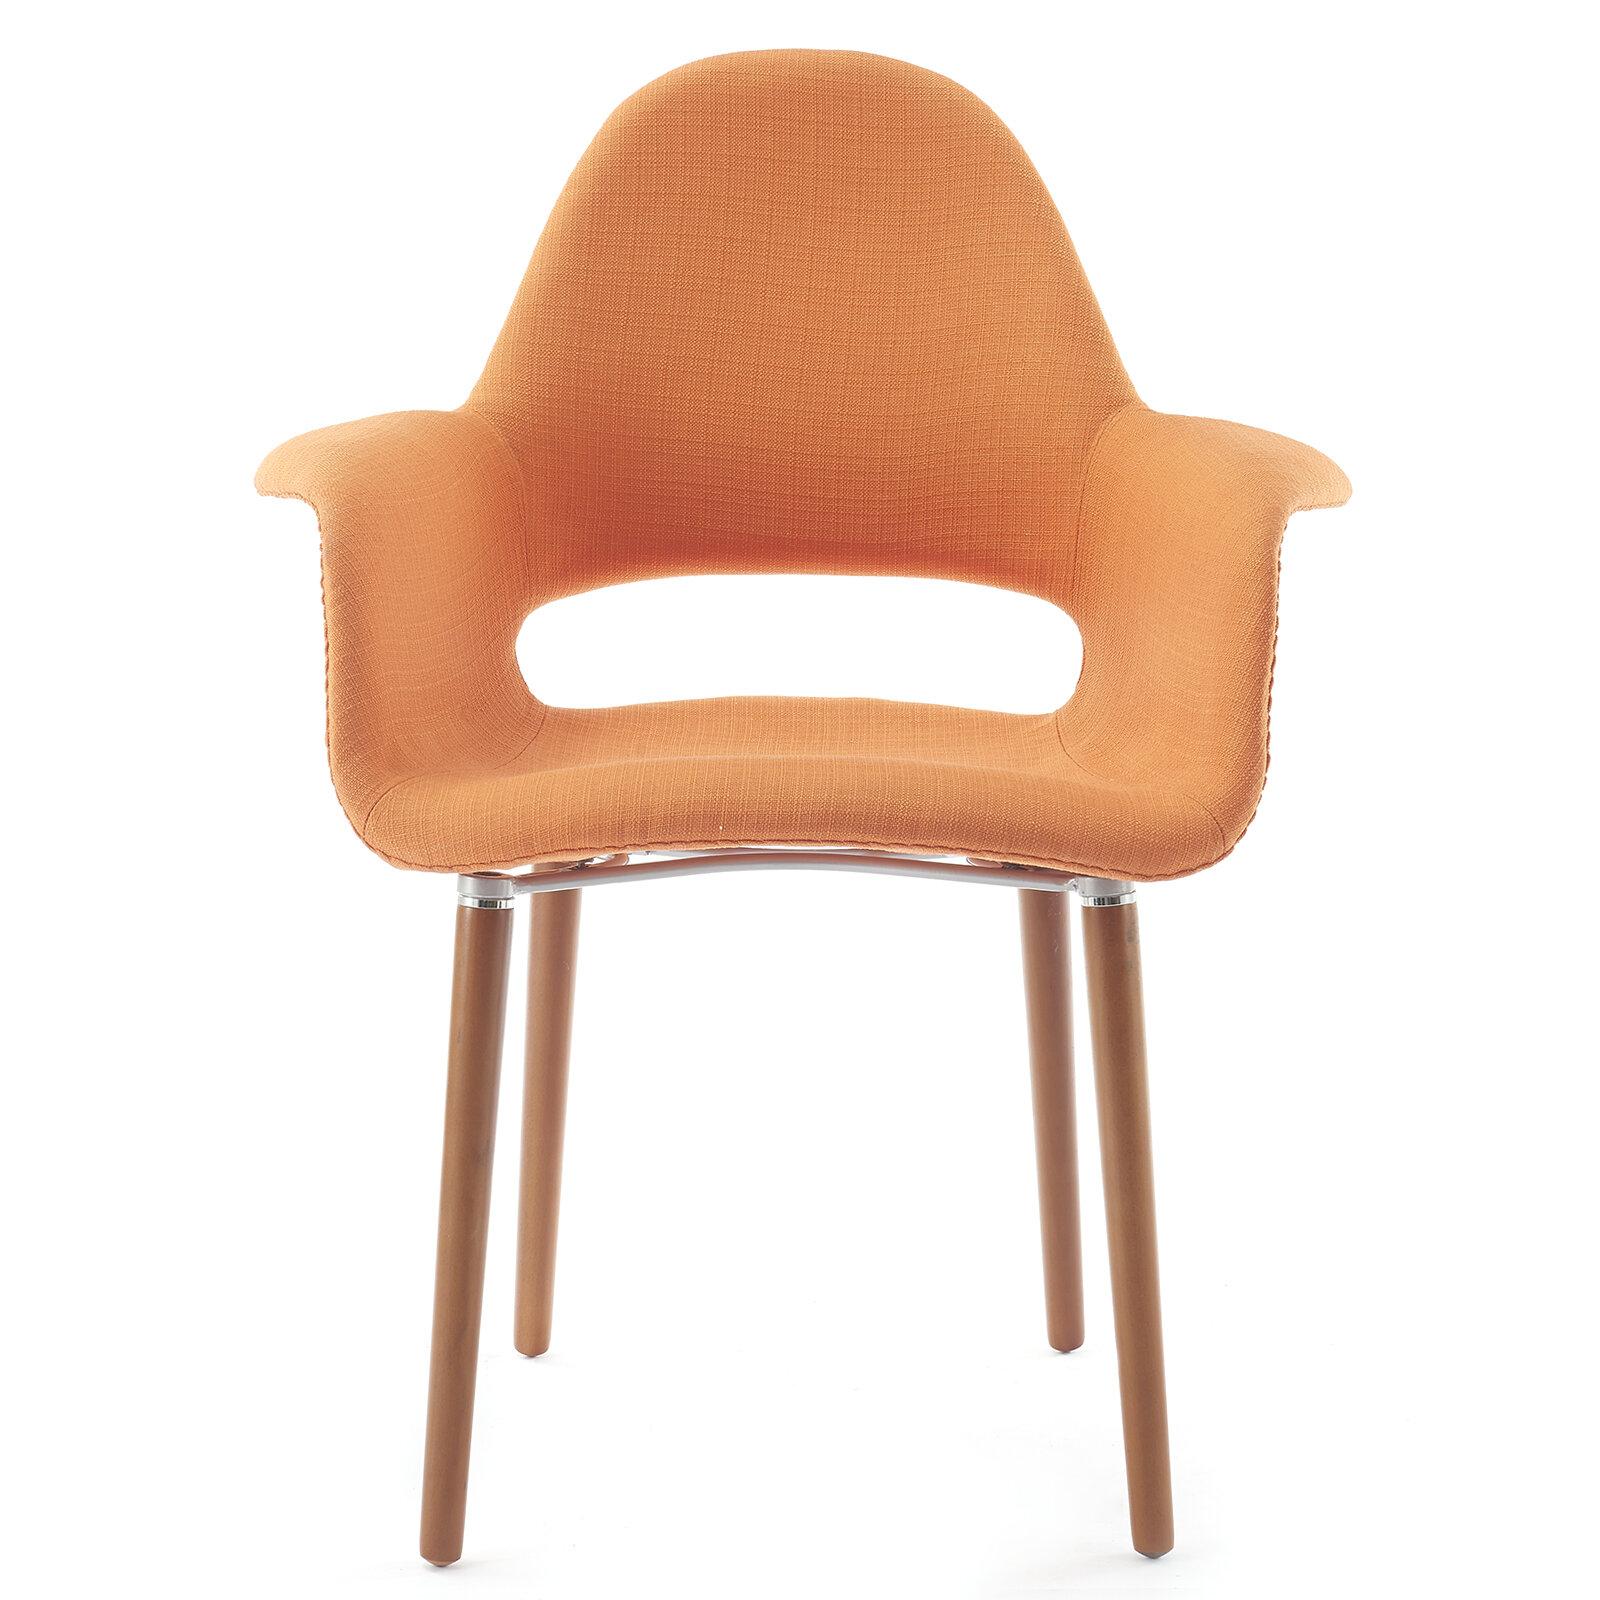 Miraculous Conrad Dining Chair Camellatalisay Diy Chair Ideas Camellatalisaycom